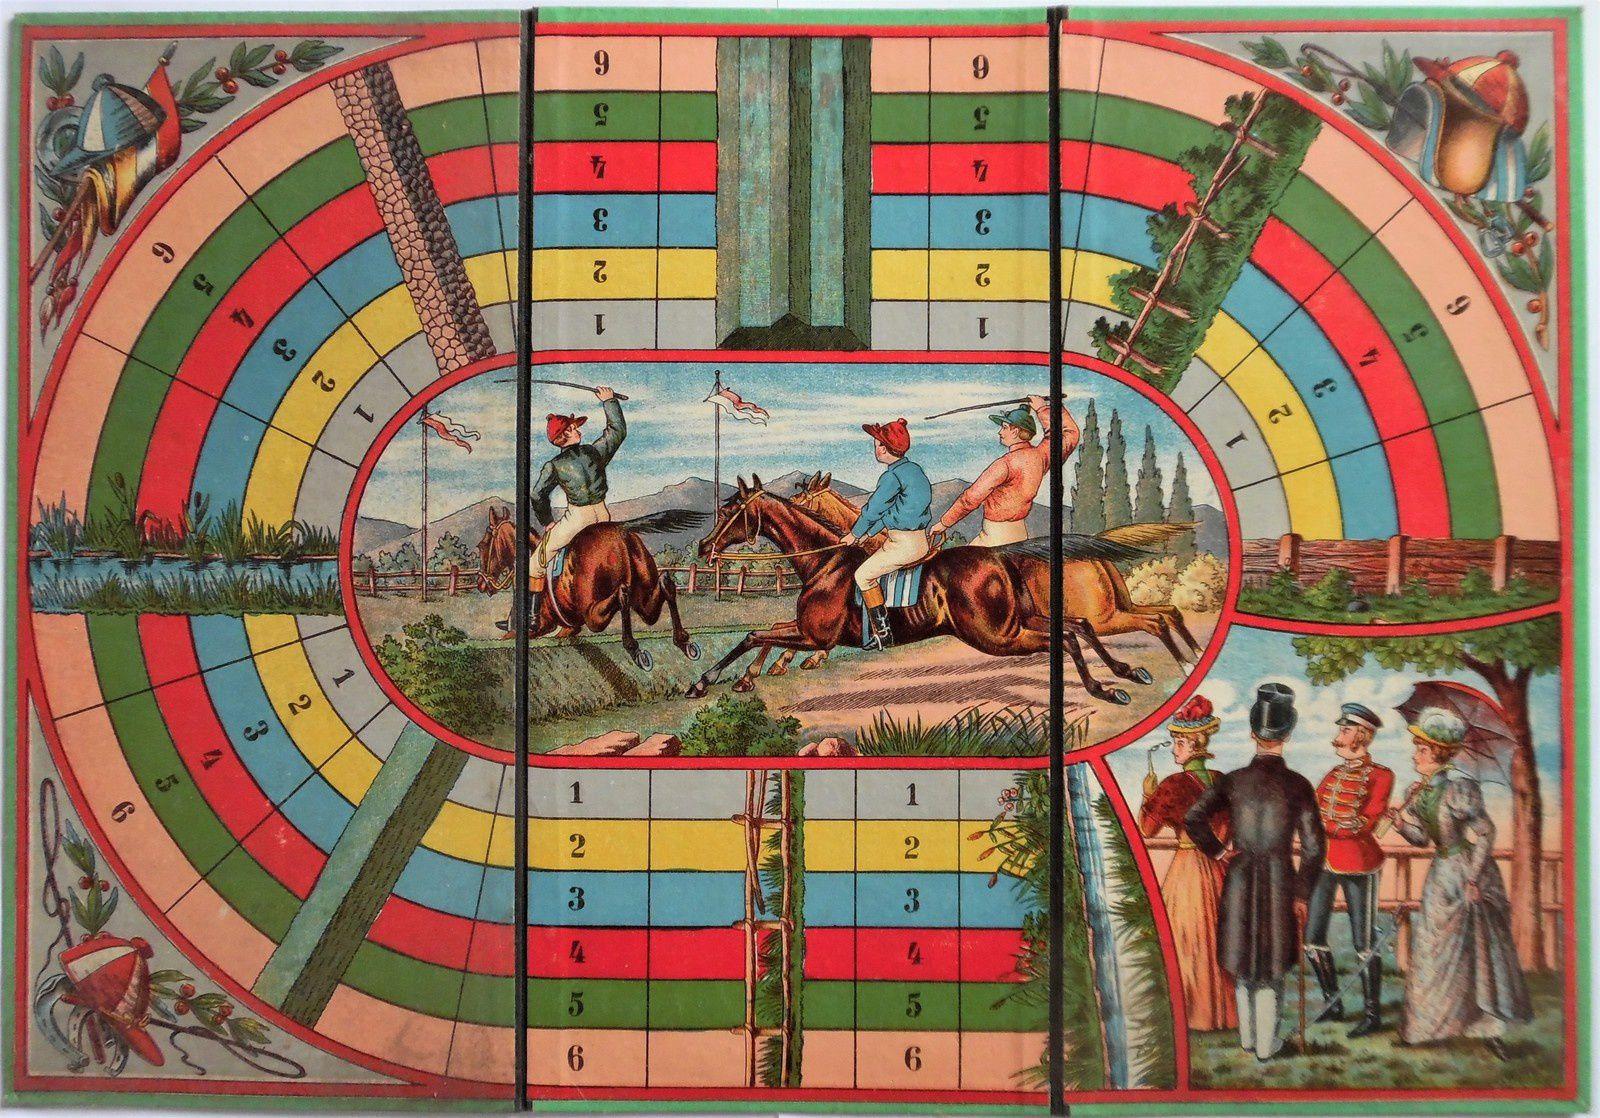 jeu de courses hippiques par AWGL